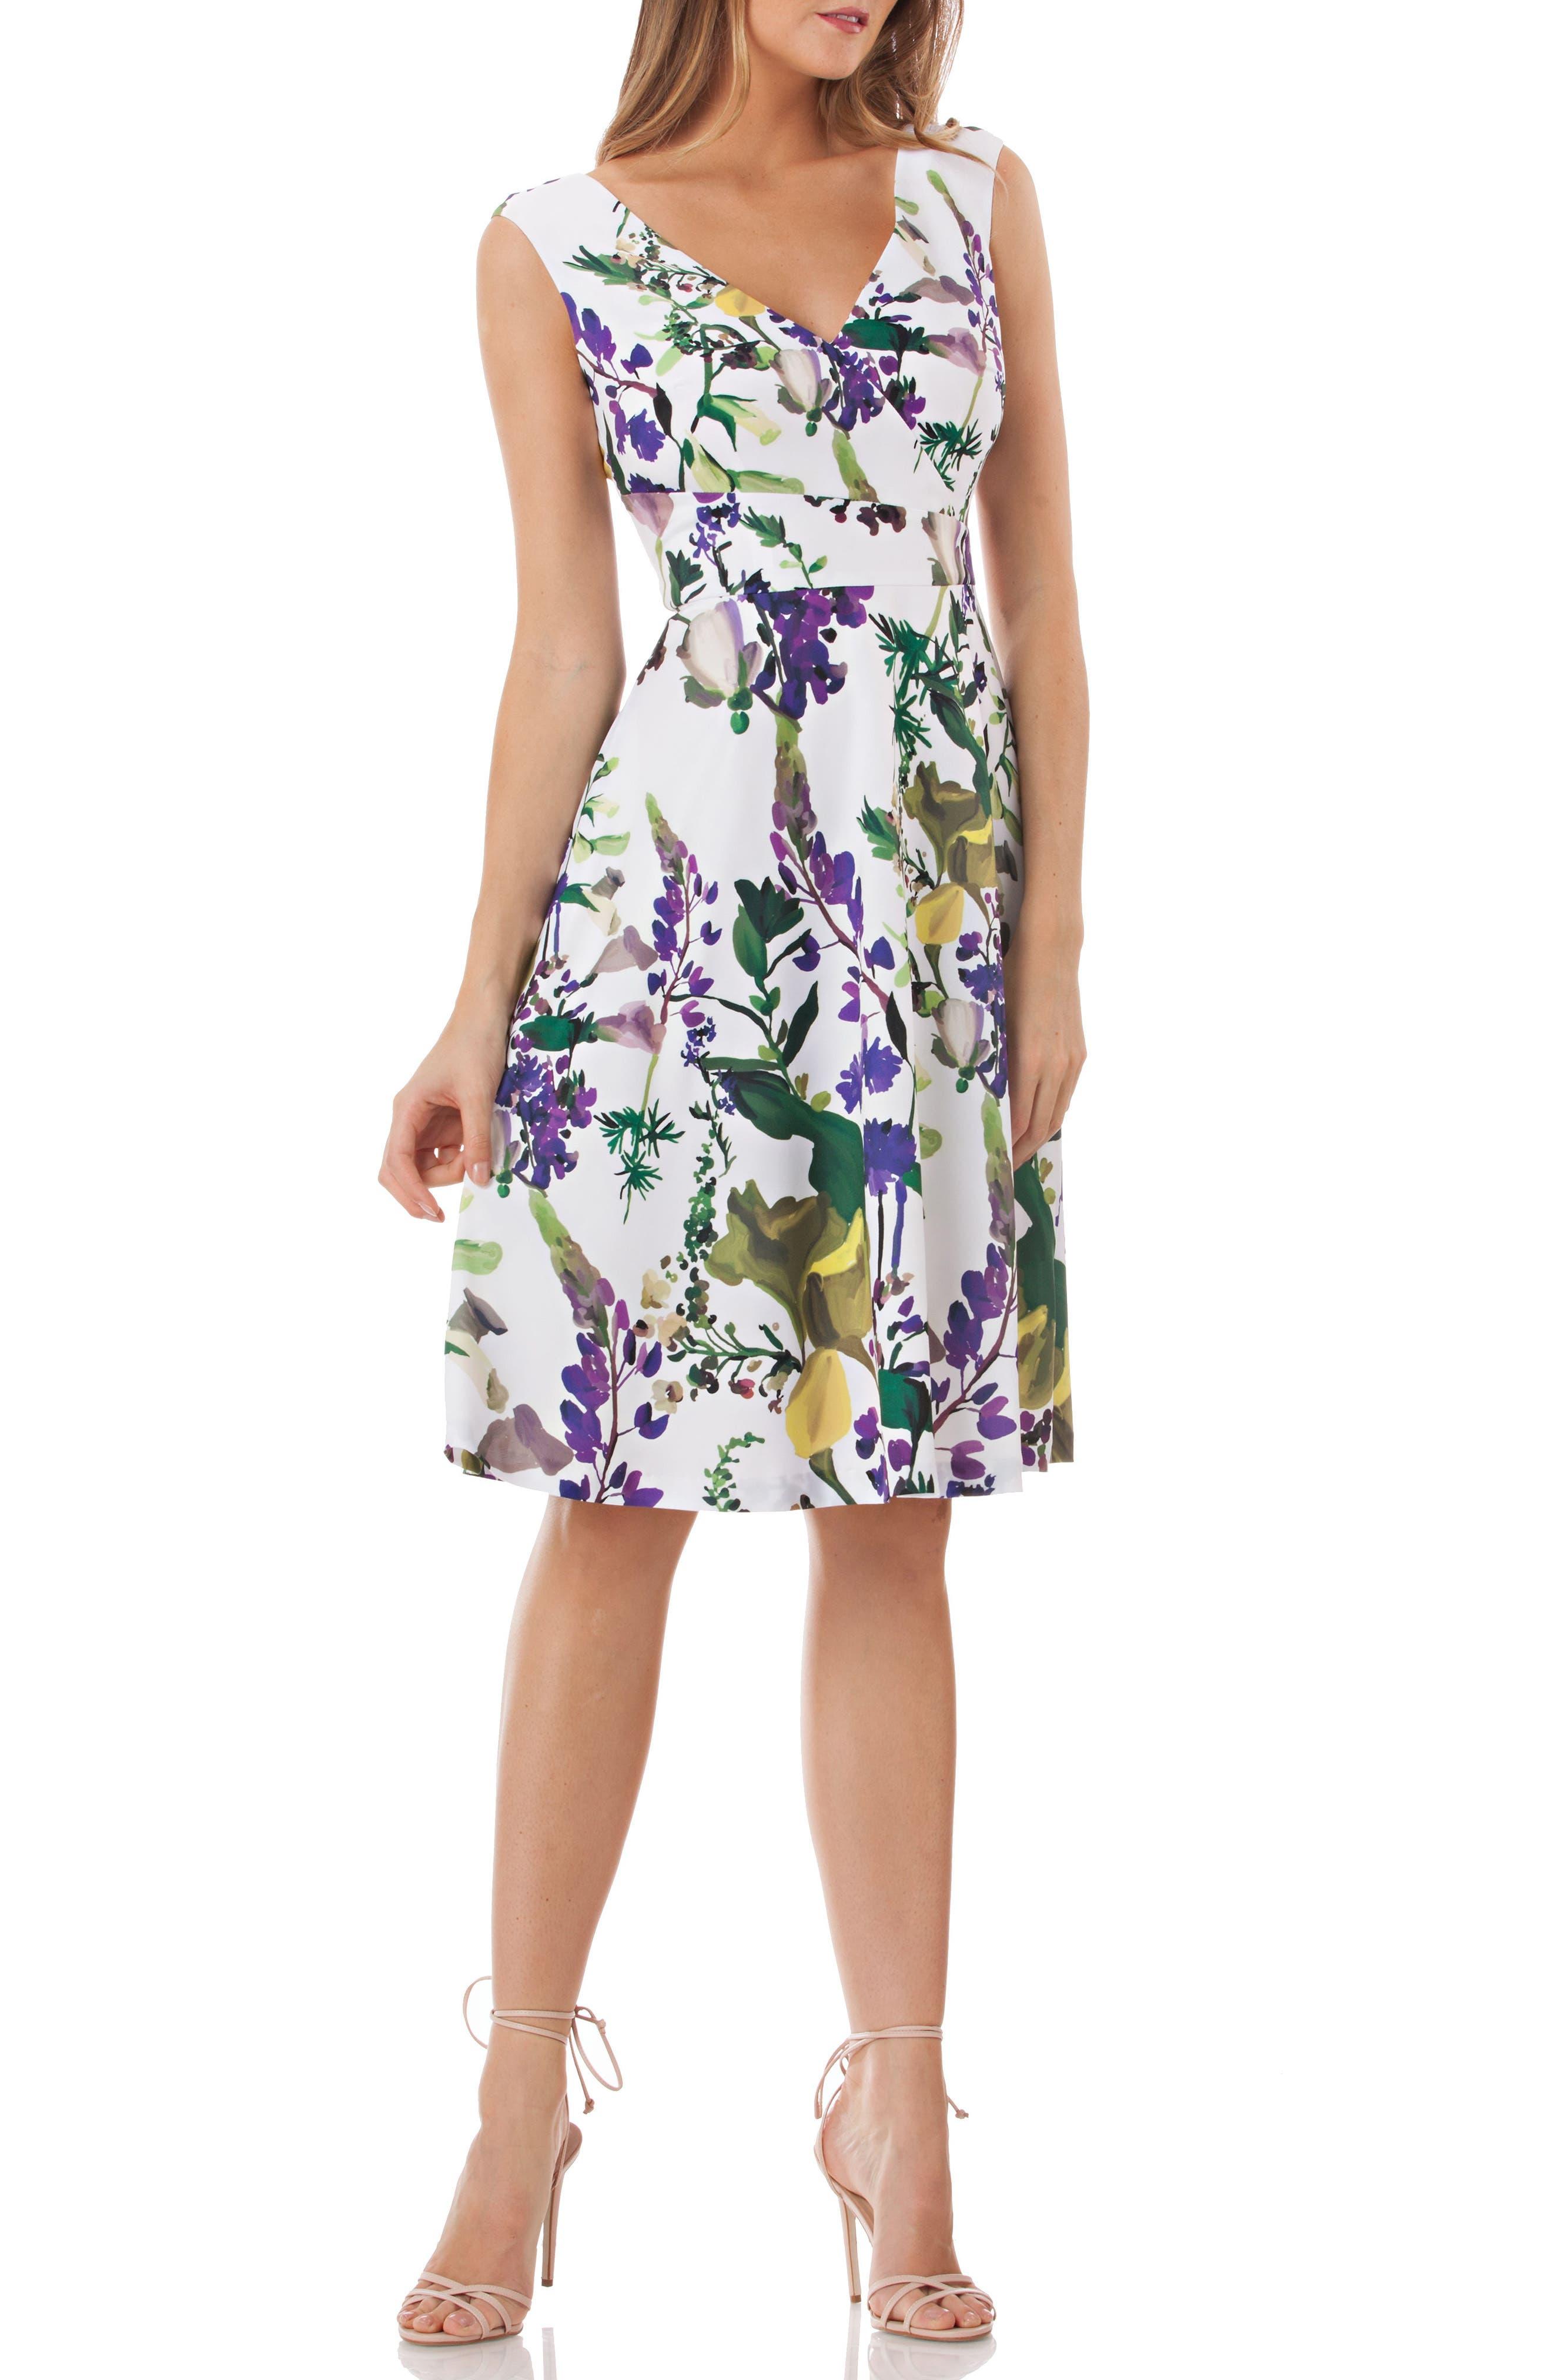 Kay Unger Floral Fit & Flare Dress, Ivory